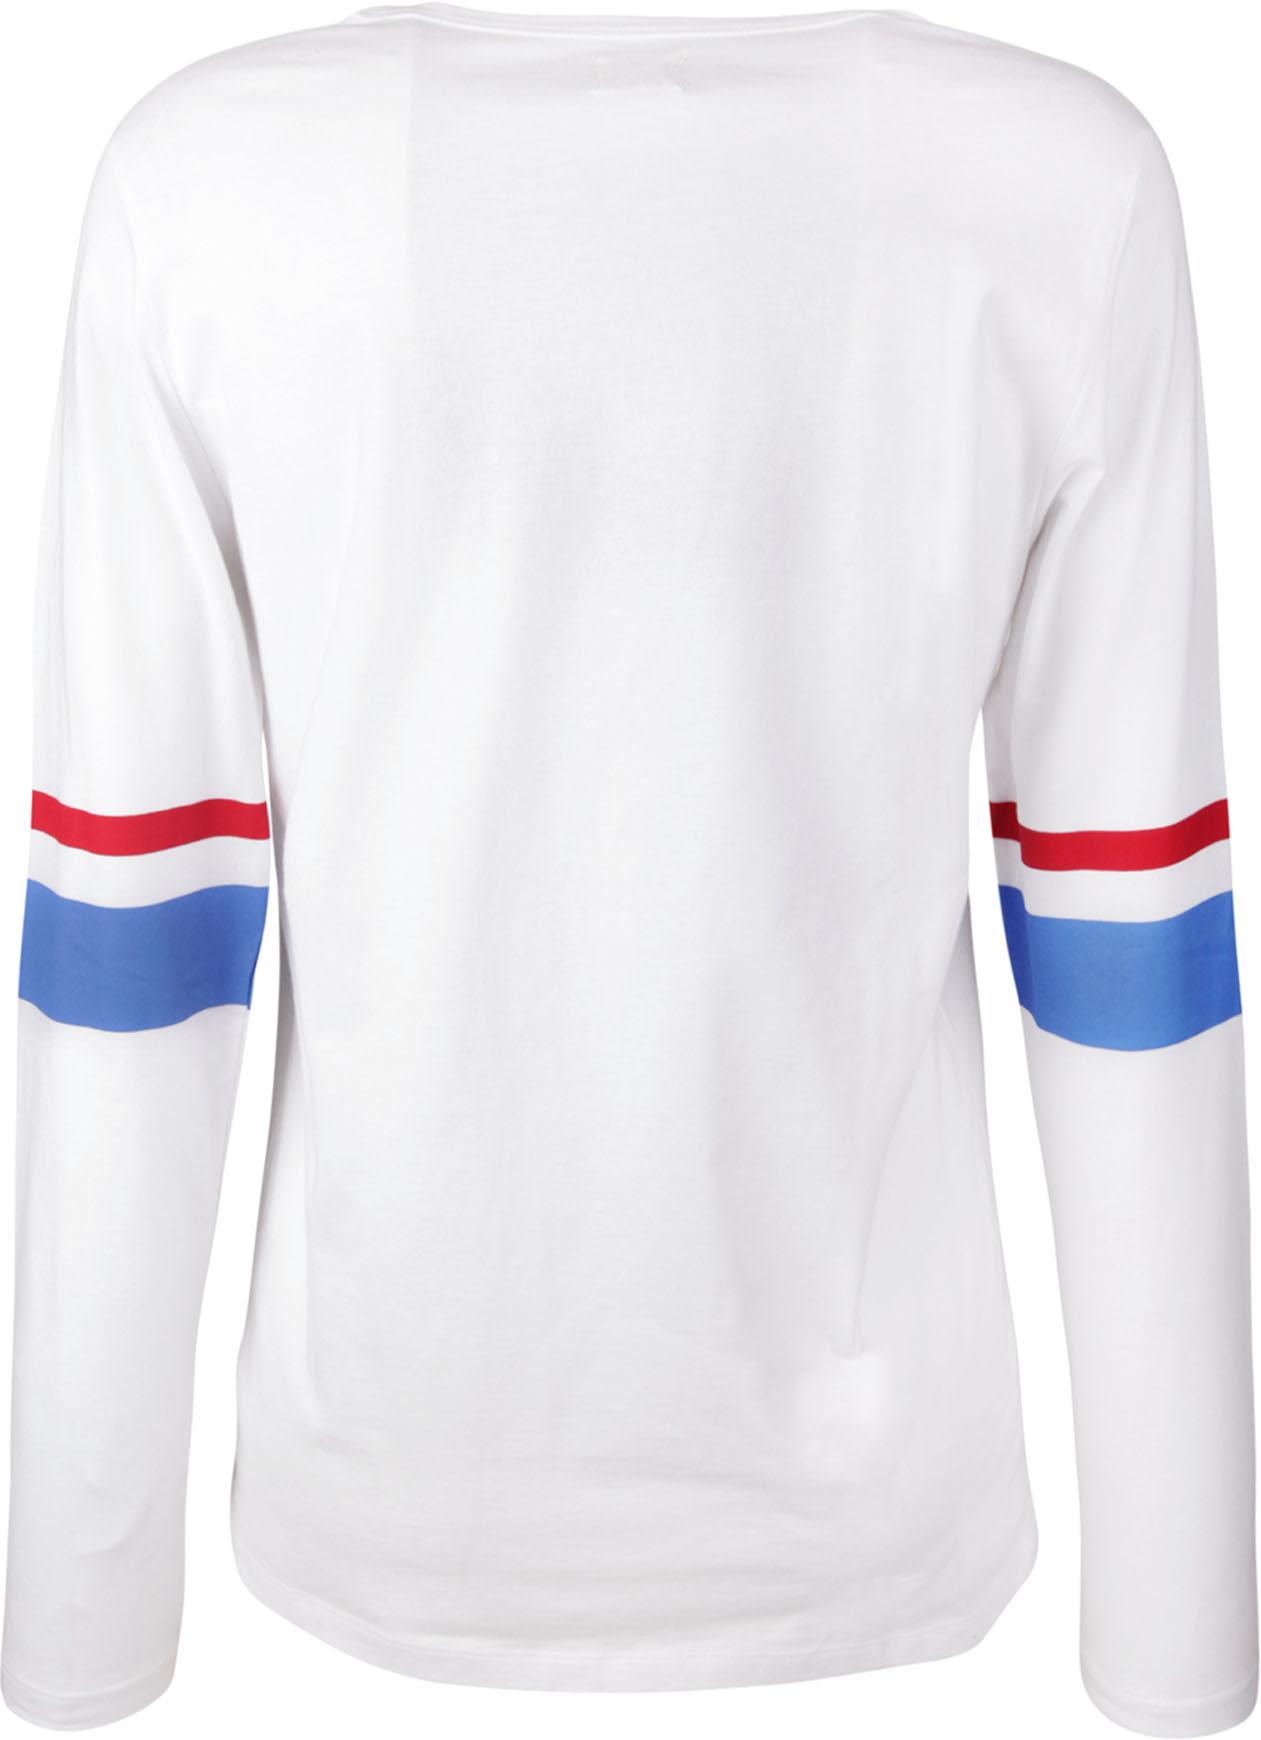 Alprausch Womens Ciao A Tutti T-Shirt Casual T-Shirts